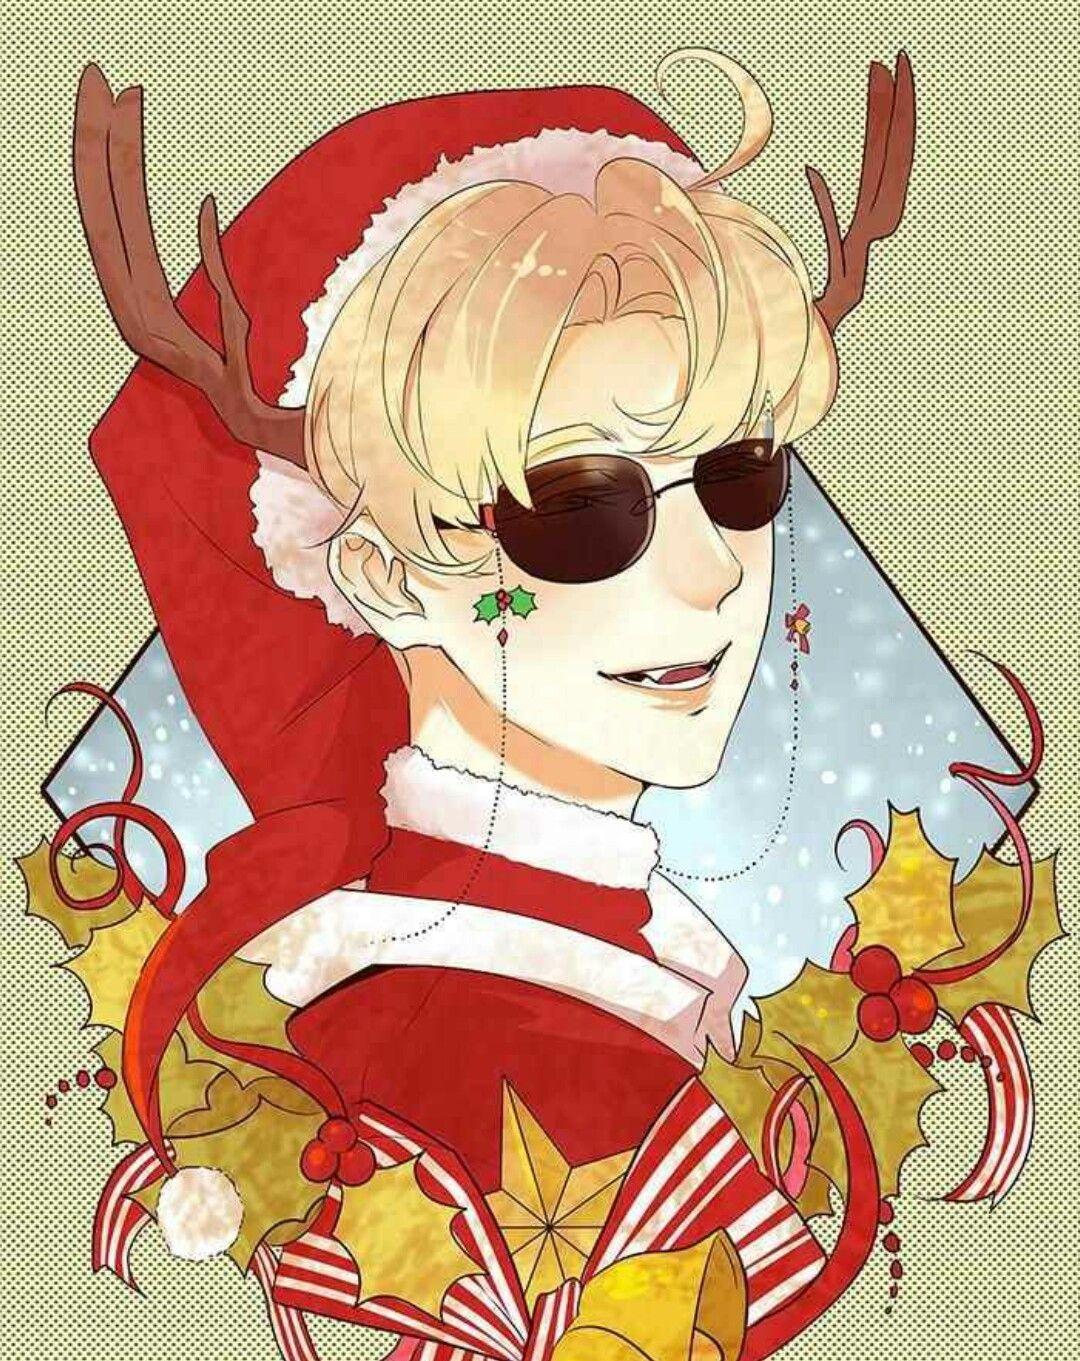 Pin by Everli on Flawless Flawless webtoon, Anime, Manhwa